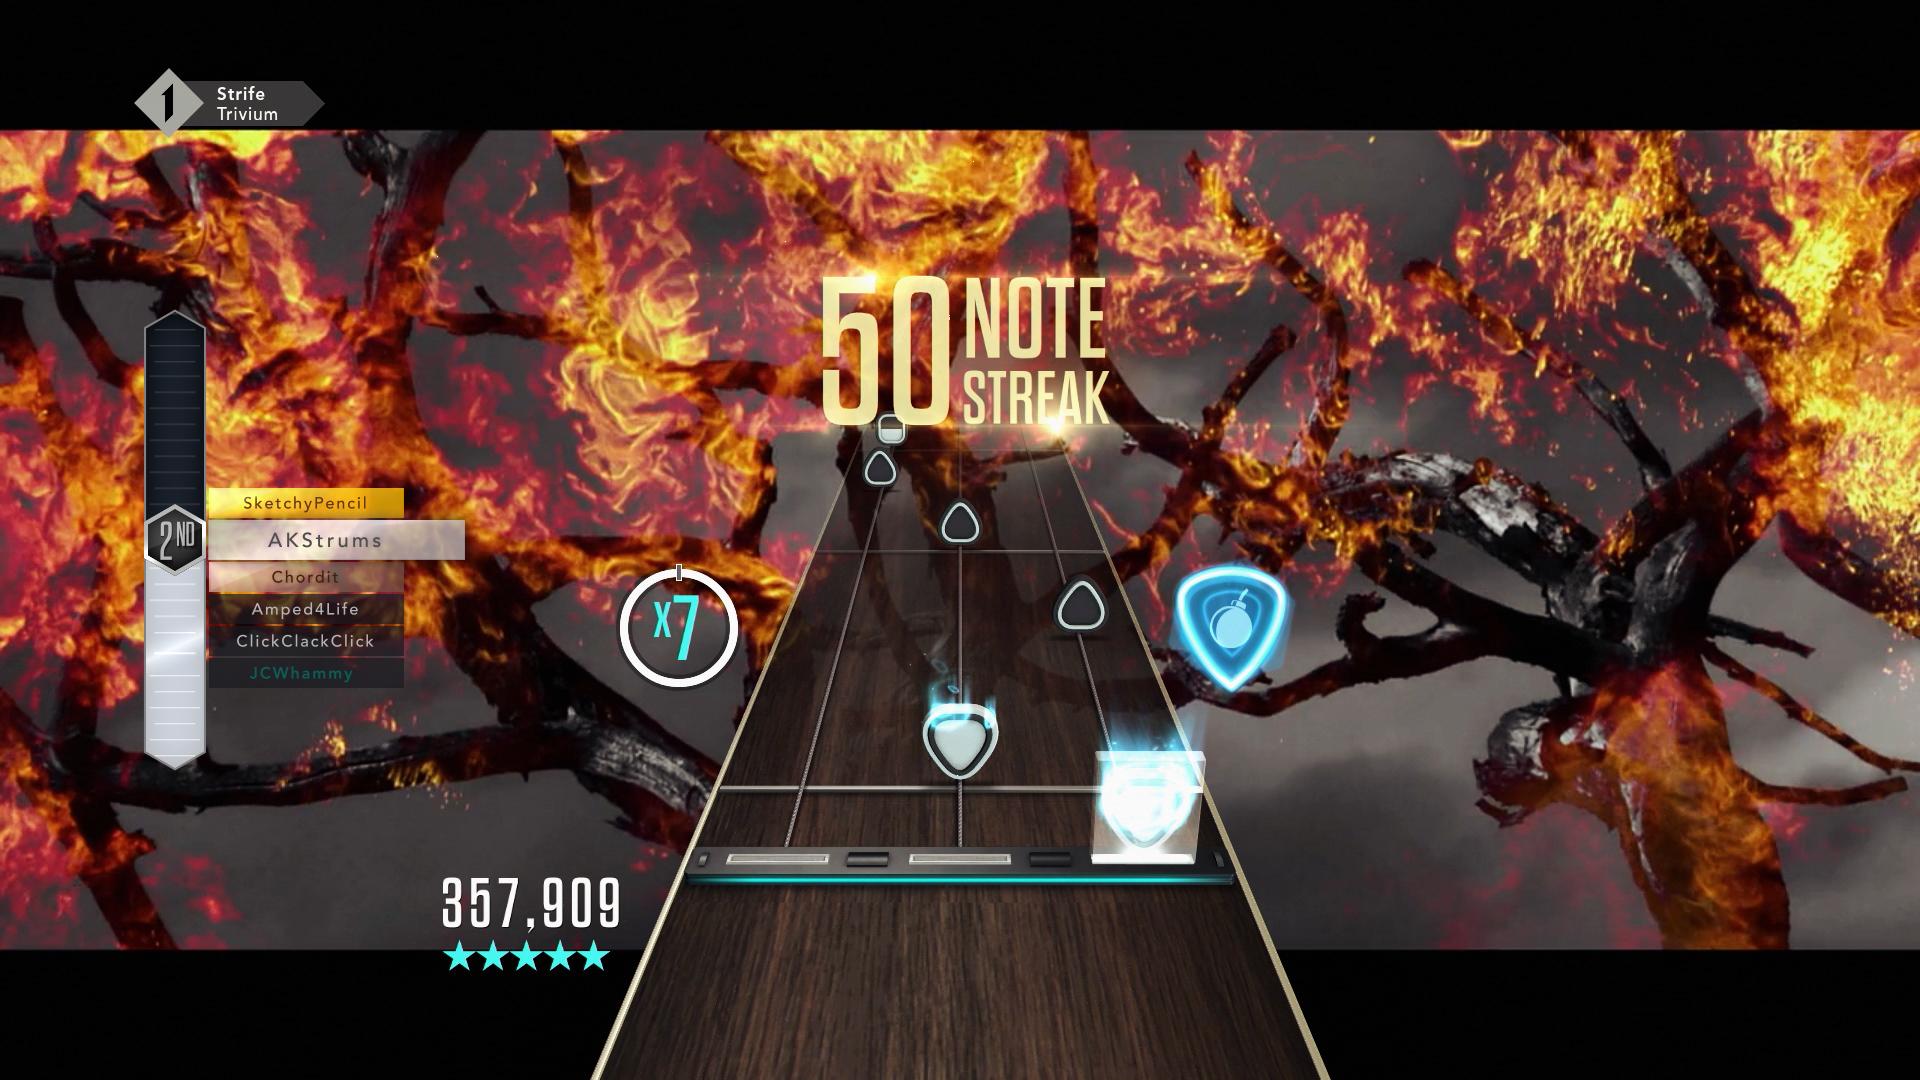 Guitar Hero Backgrounds on Wallpapers Vista